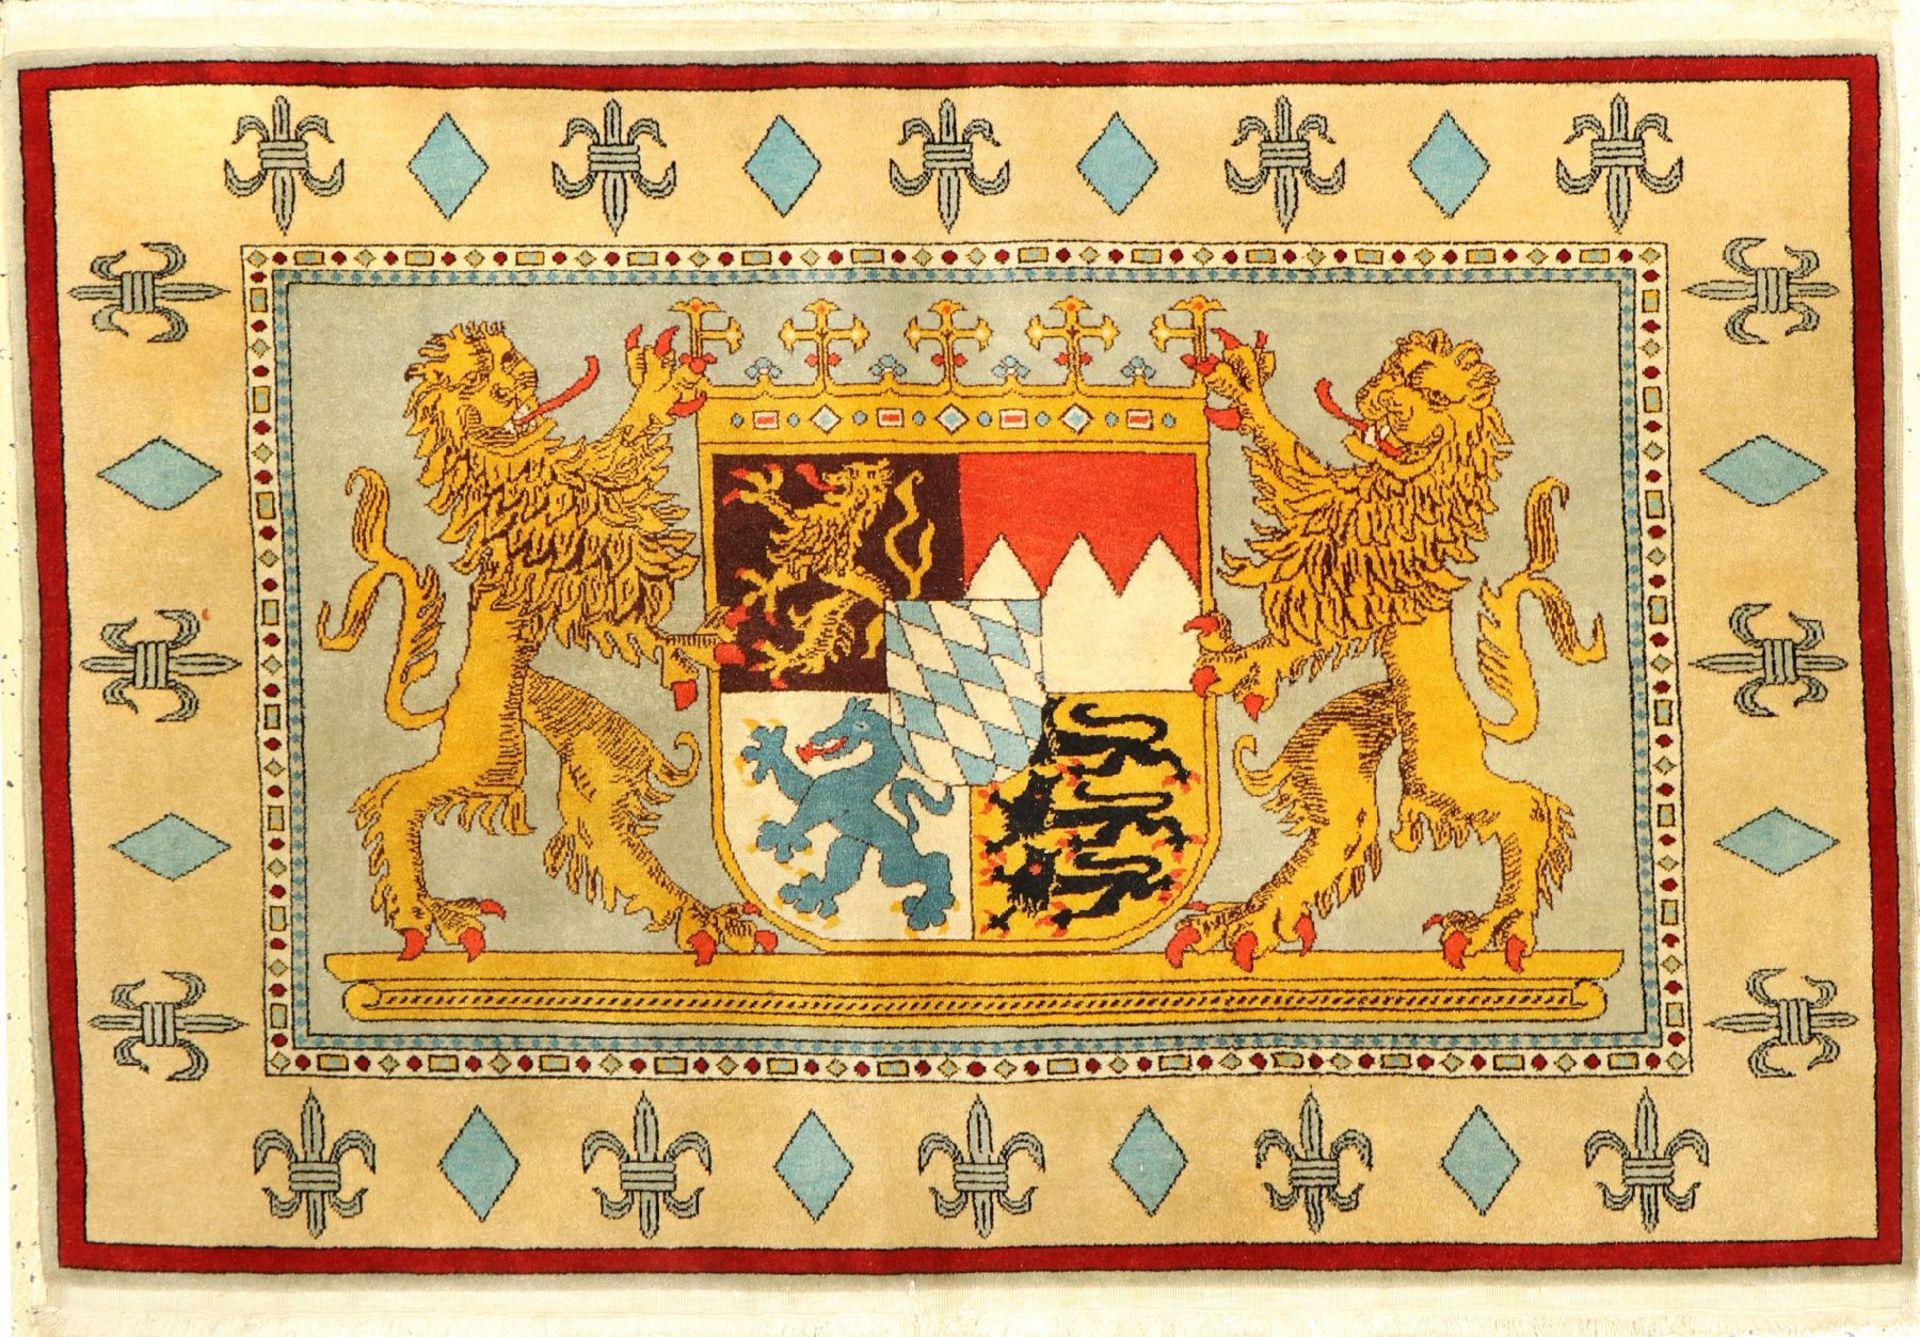 Wappen Teppich(Bayern Ludwig II ),Türkei, 50 Jahre, 126 x 83 cm,EHZ: 2Coat Of Arms Rug (Bayern